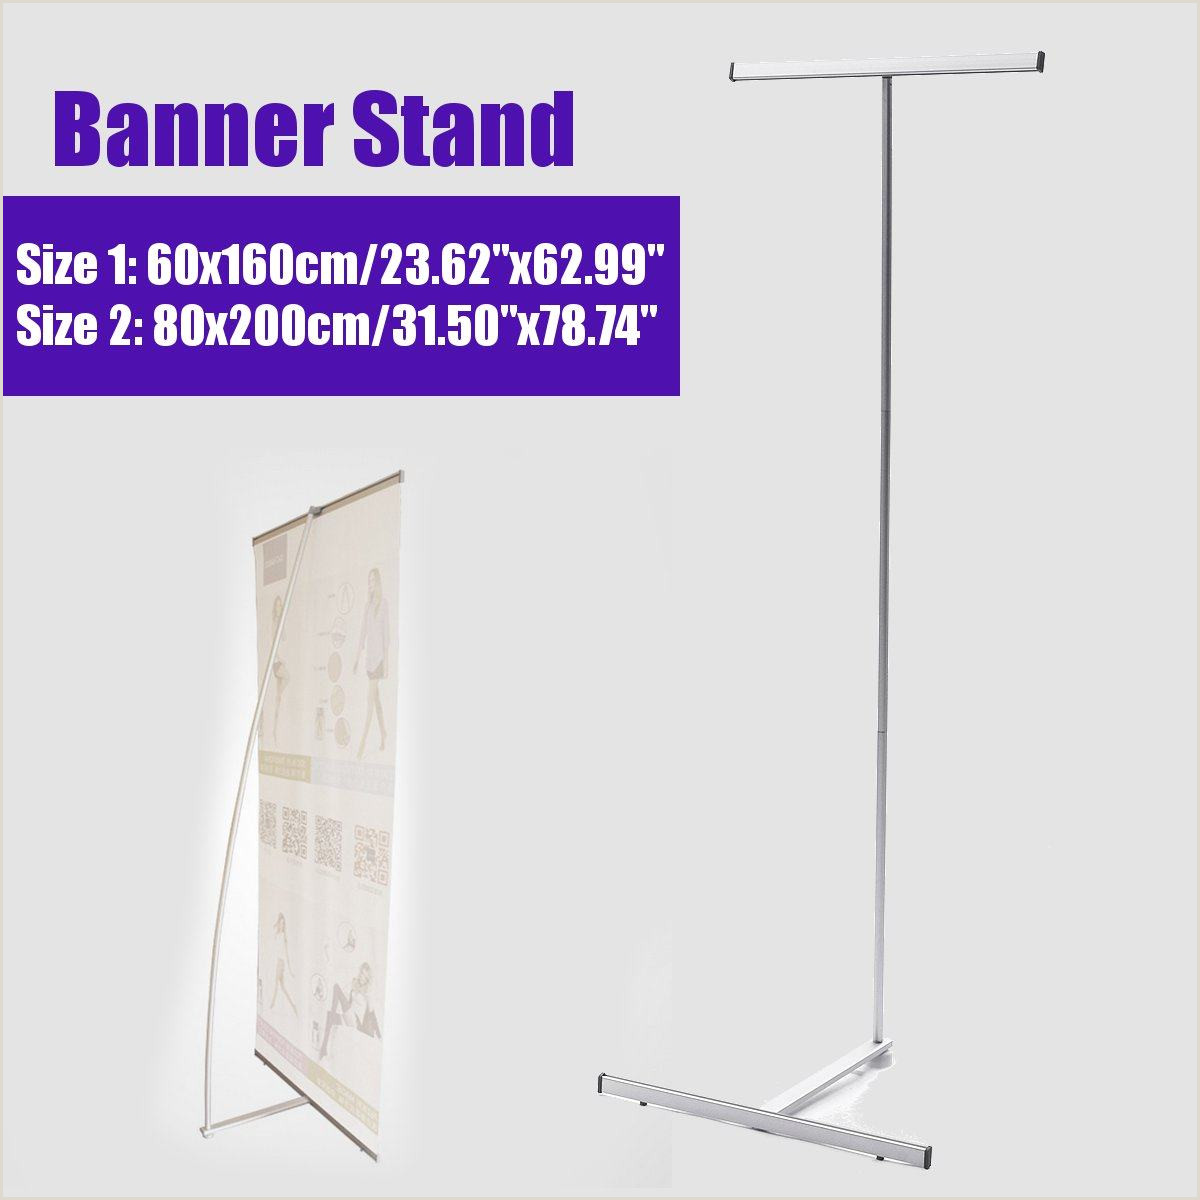 Banner Frame Stand 60 160cm 80 180cm Iron Frame Poster Display Banner Stand Kit Floor Standing Frame Label Sign Billboard Rack Trade Show